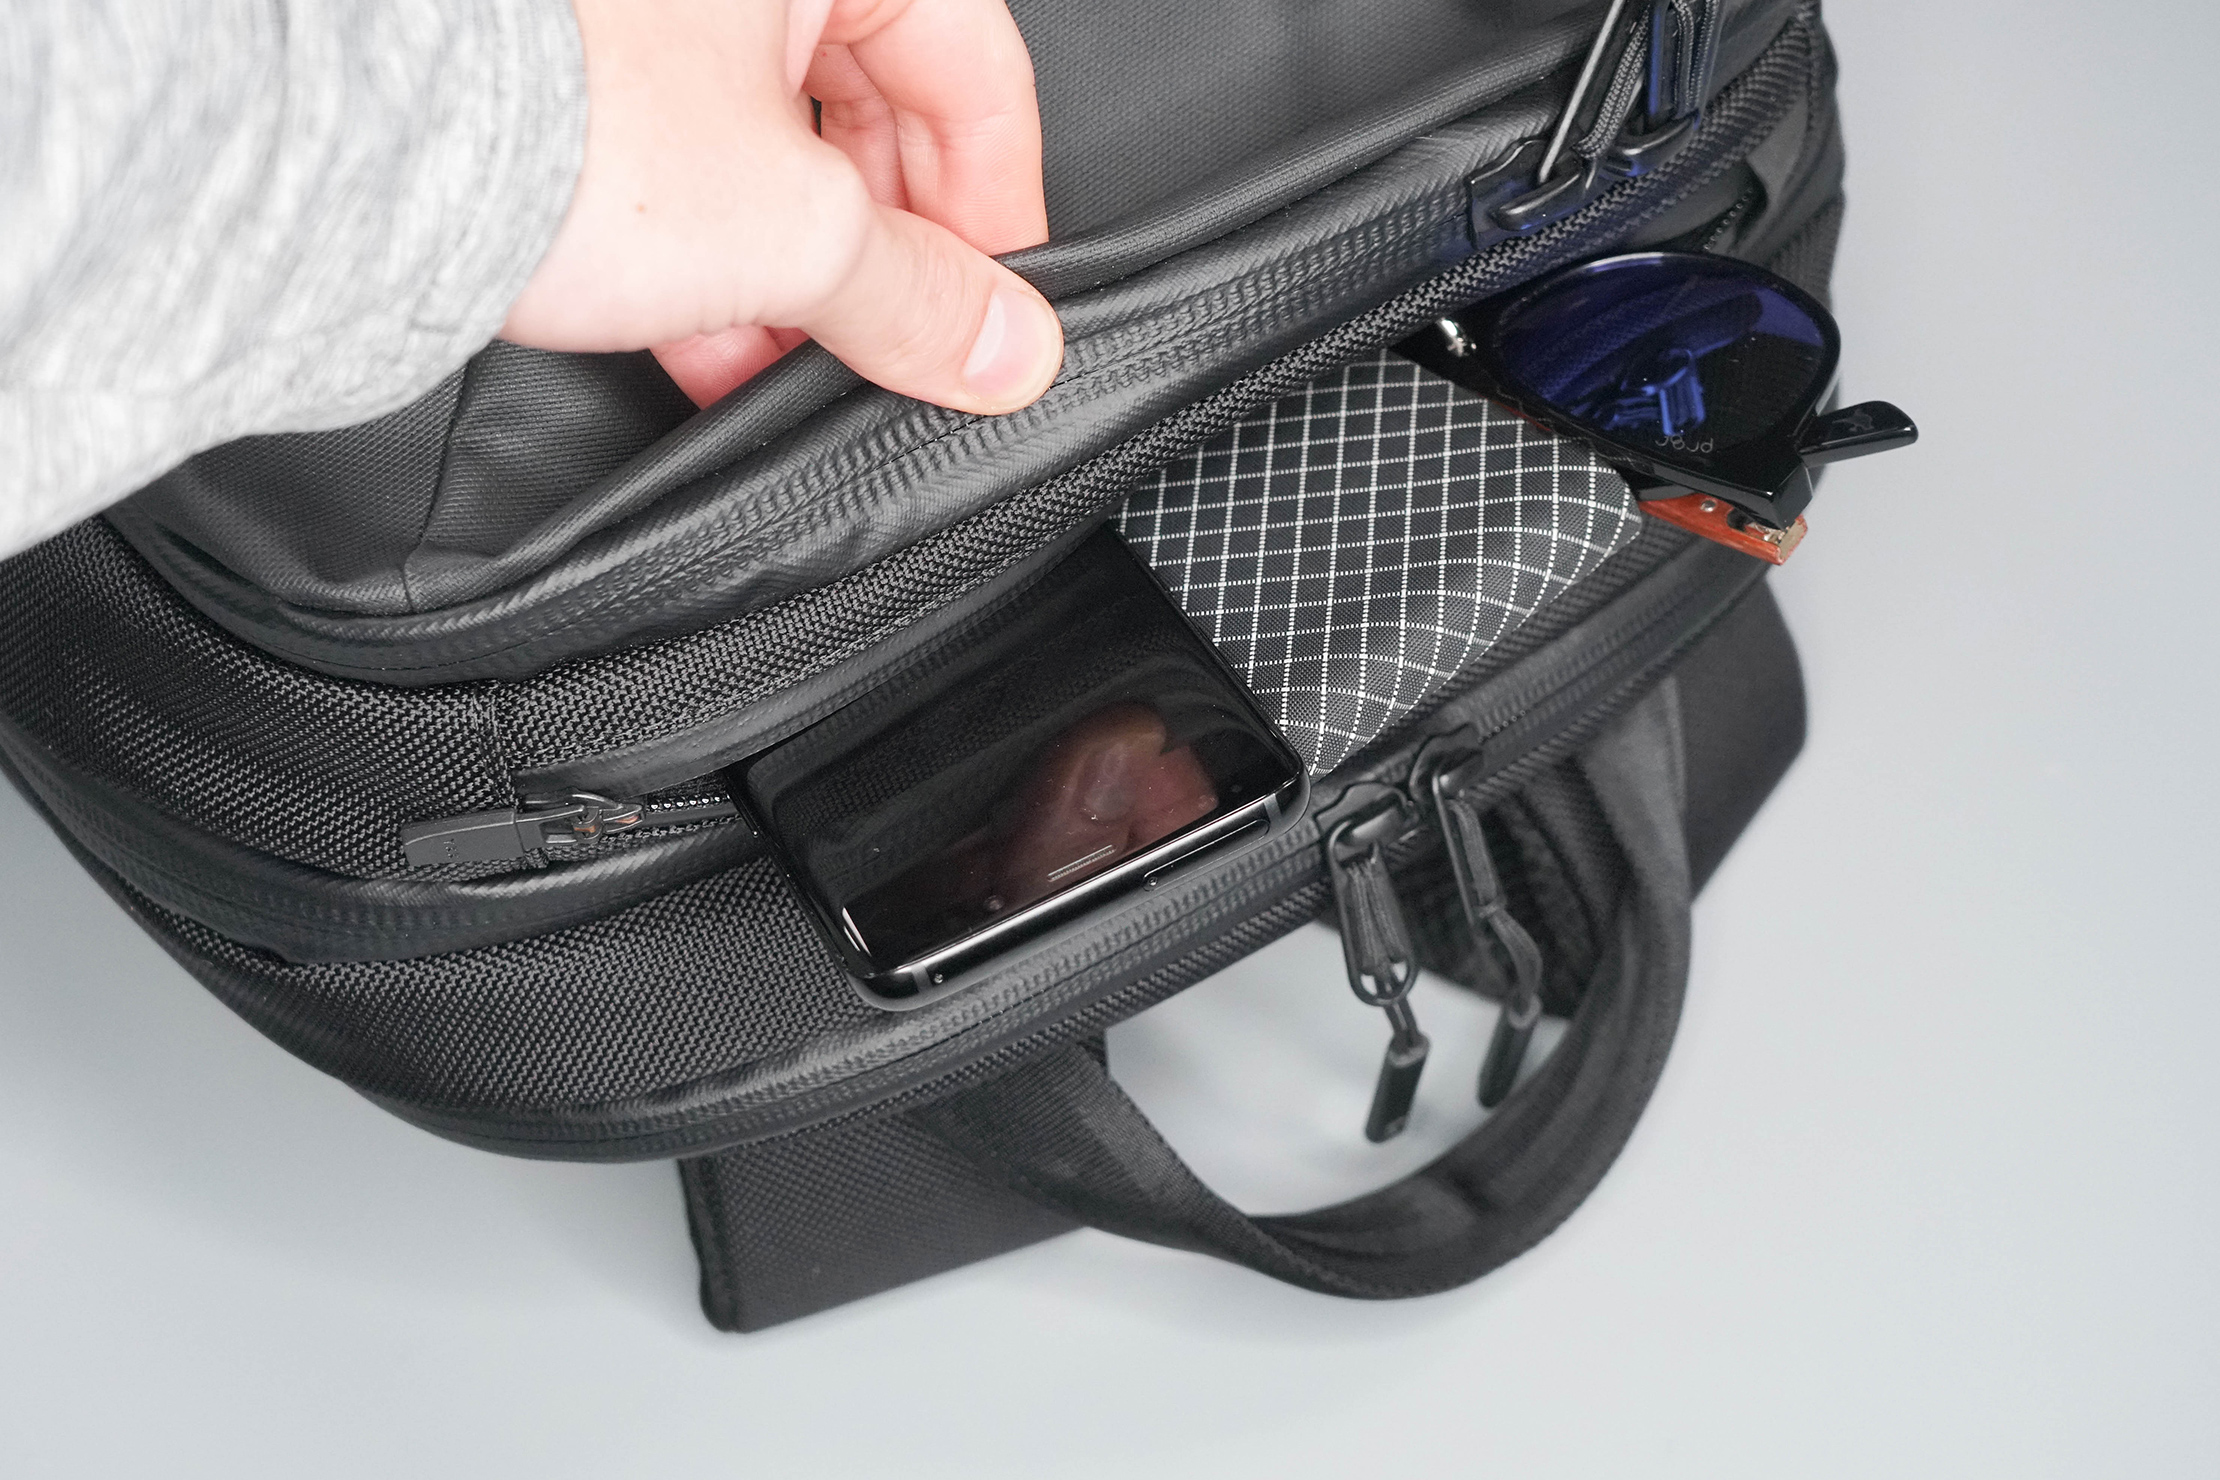 Aer Tech Pack 2 Quick-Grab Pocket